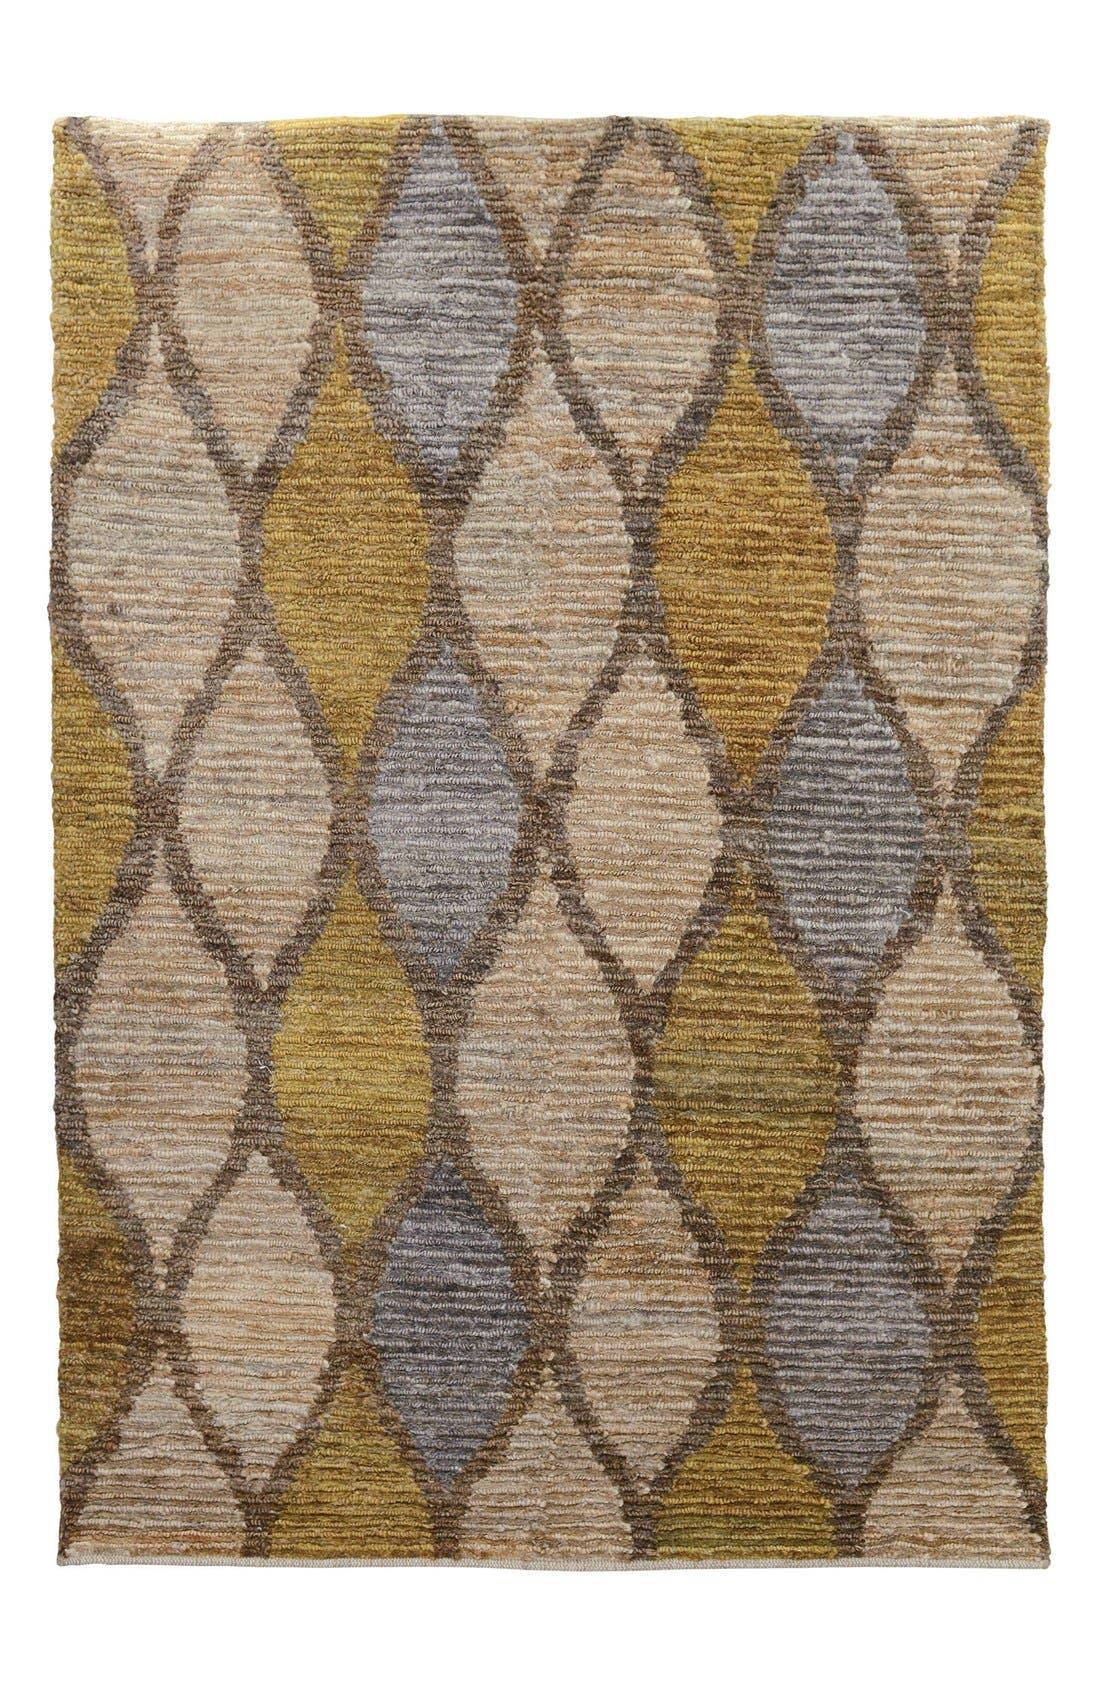 'Melbourne' Rug,                         Main,                         color, Brown/ Gold